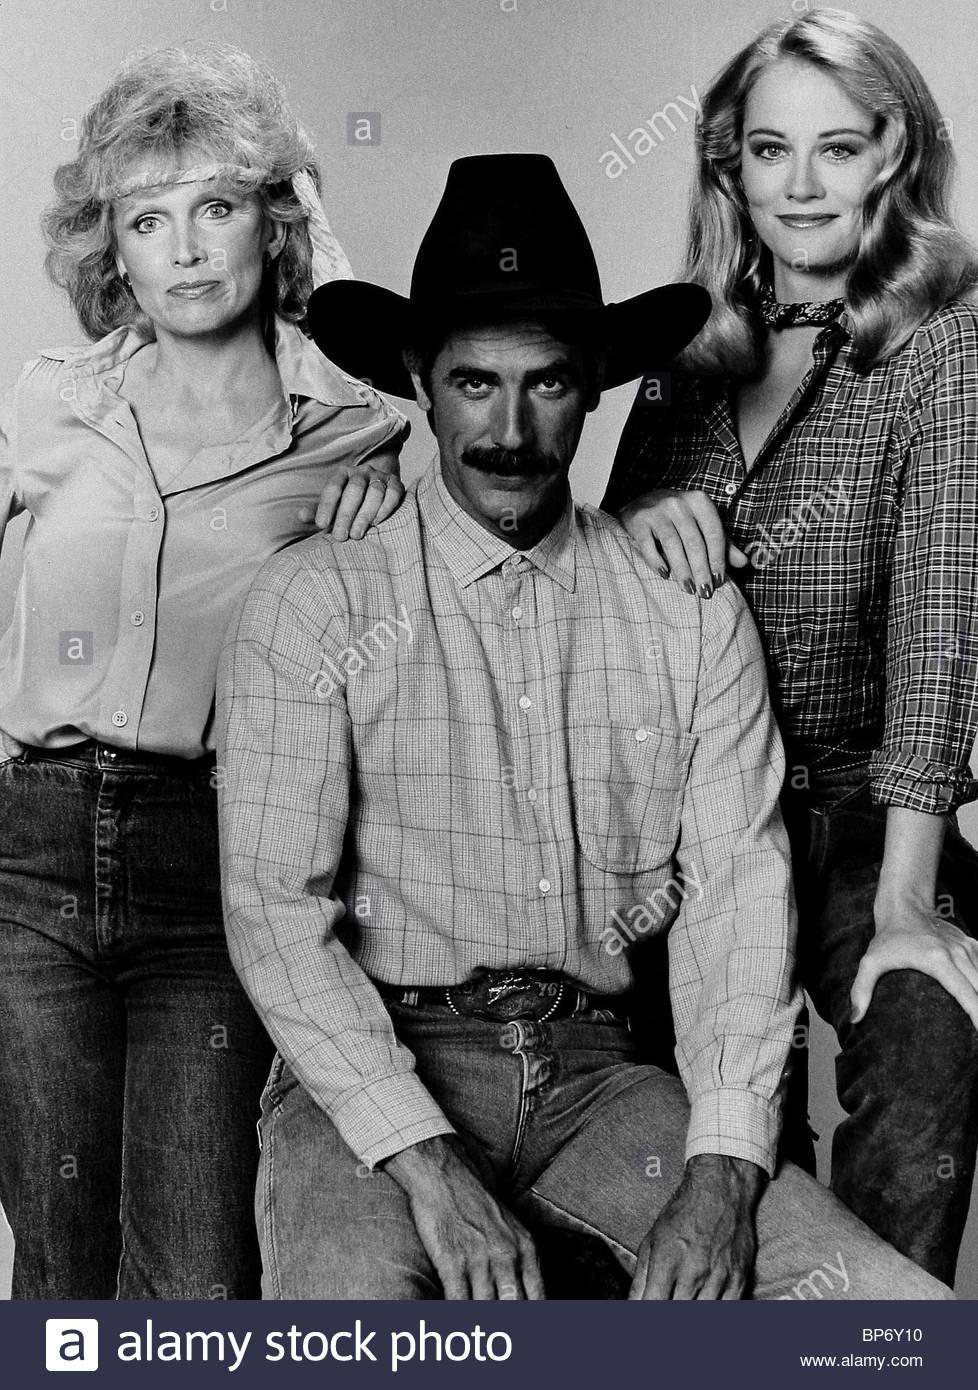 Carmen Electra born April 20, 1972 (age 46),Robin Johnson Hot pic Renee O'Connor,Anthony Hopkins (born 1937 (naturalized American citizen)